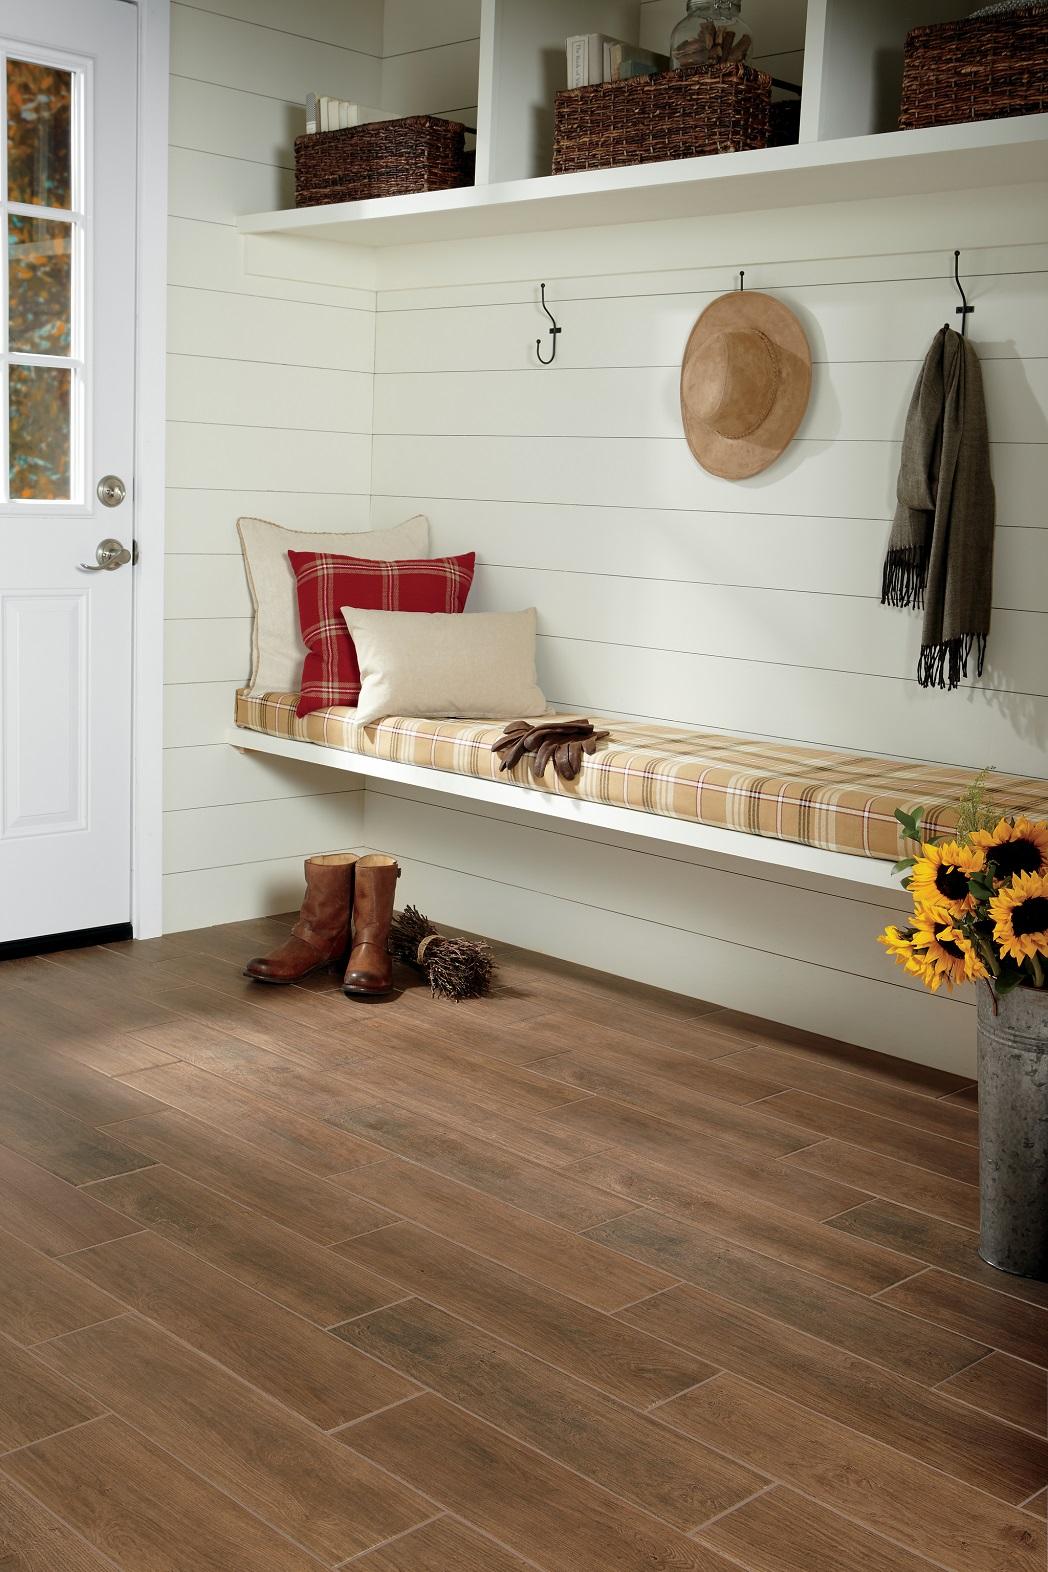 Willow Bend Tile Flooring